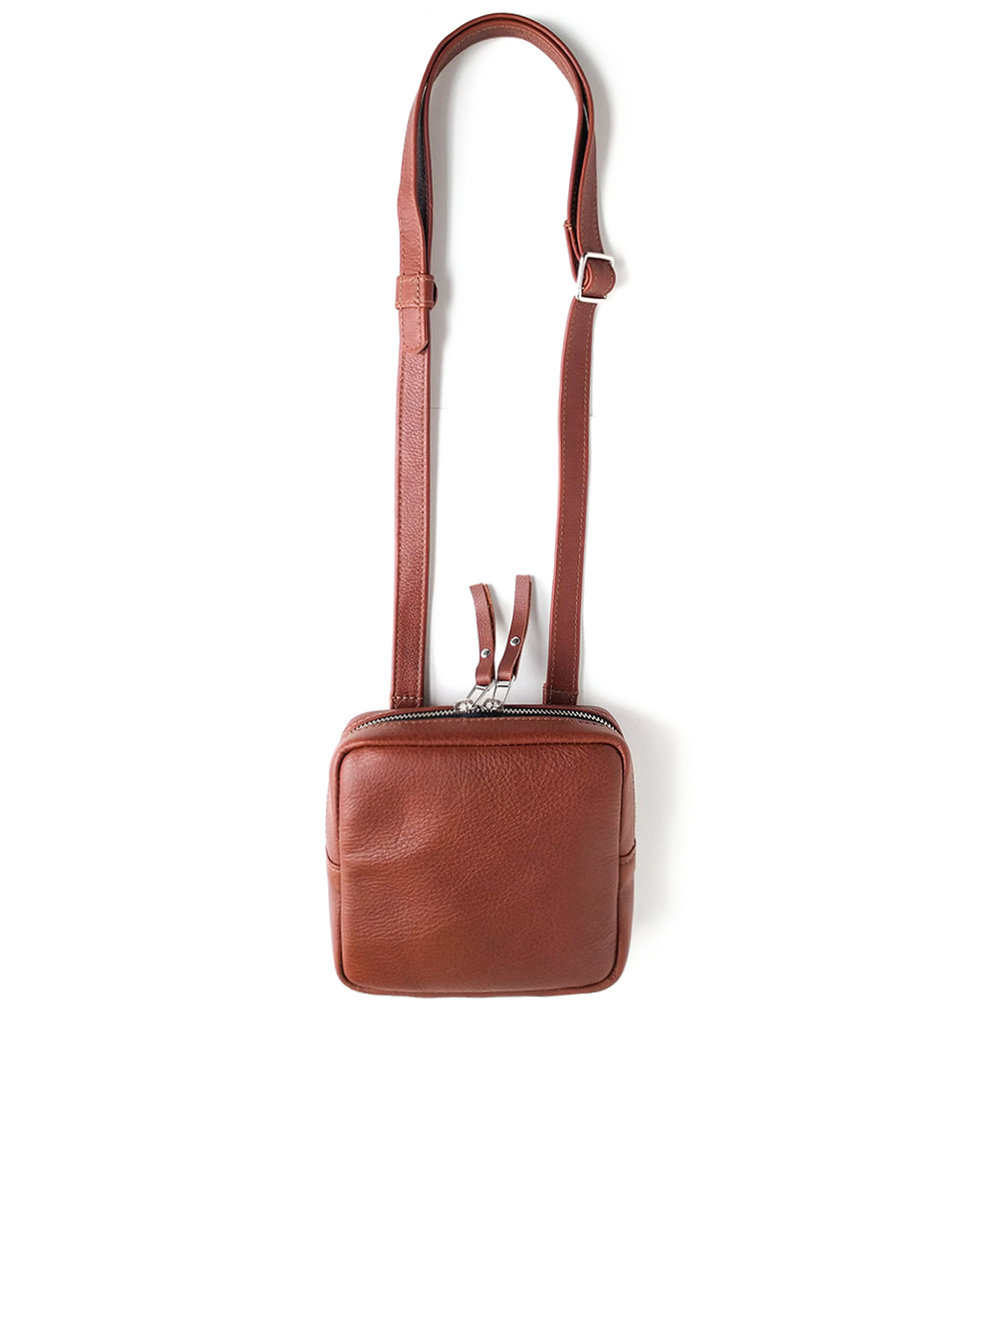 Mini handbag - more colors available110.00$